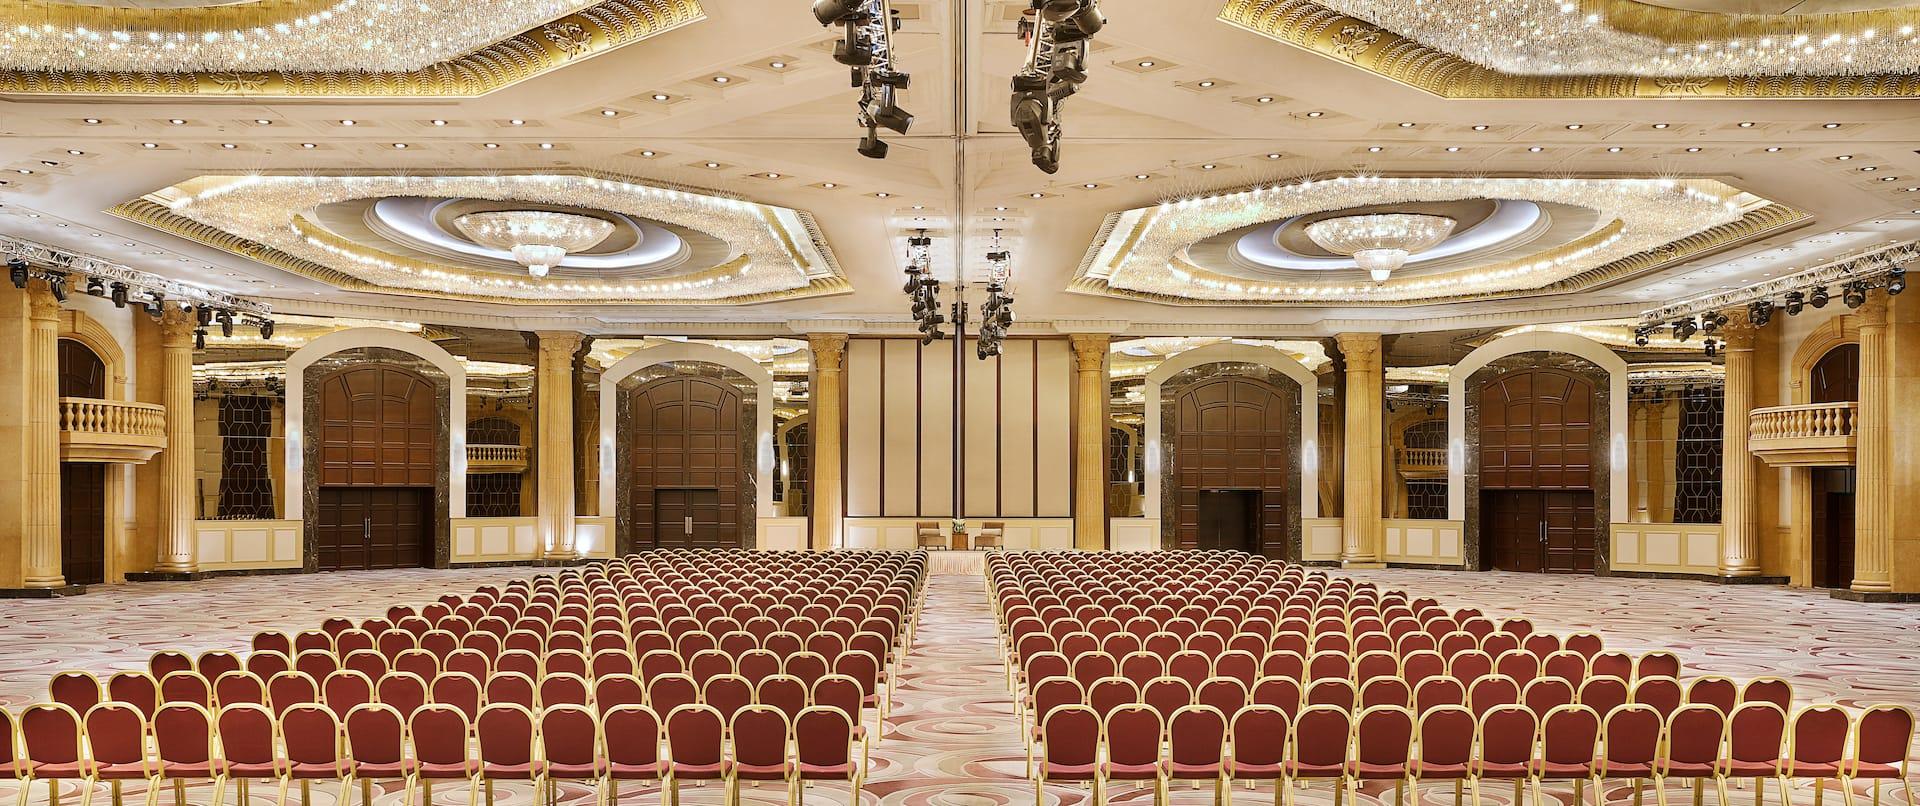 Emirate Hall